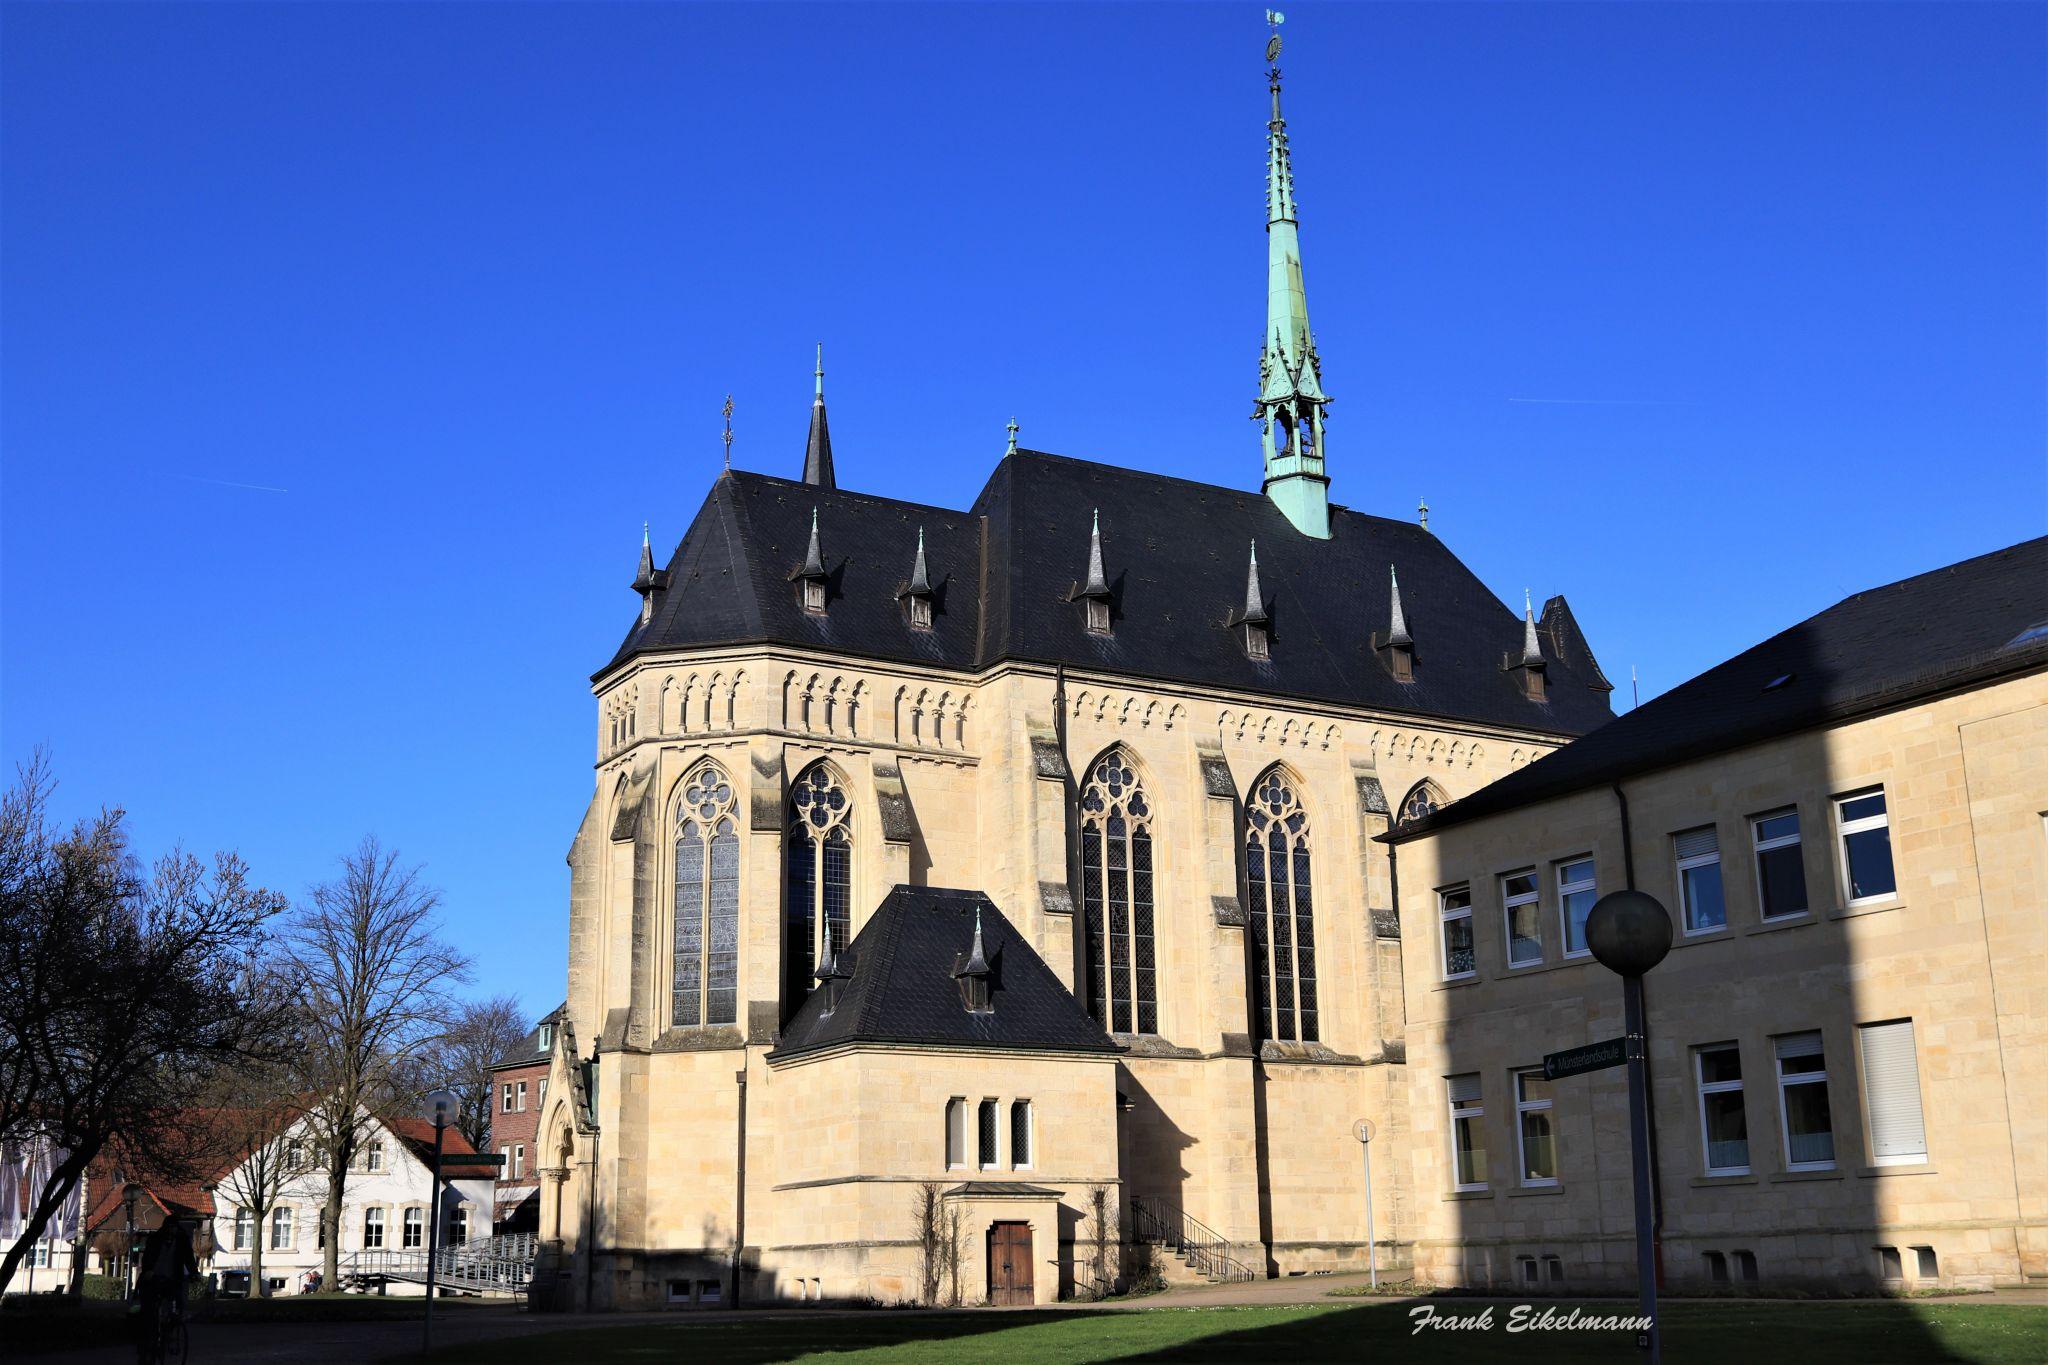 Stift Tilbeck, Germany